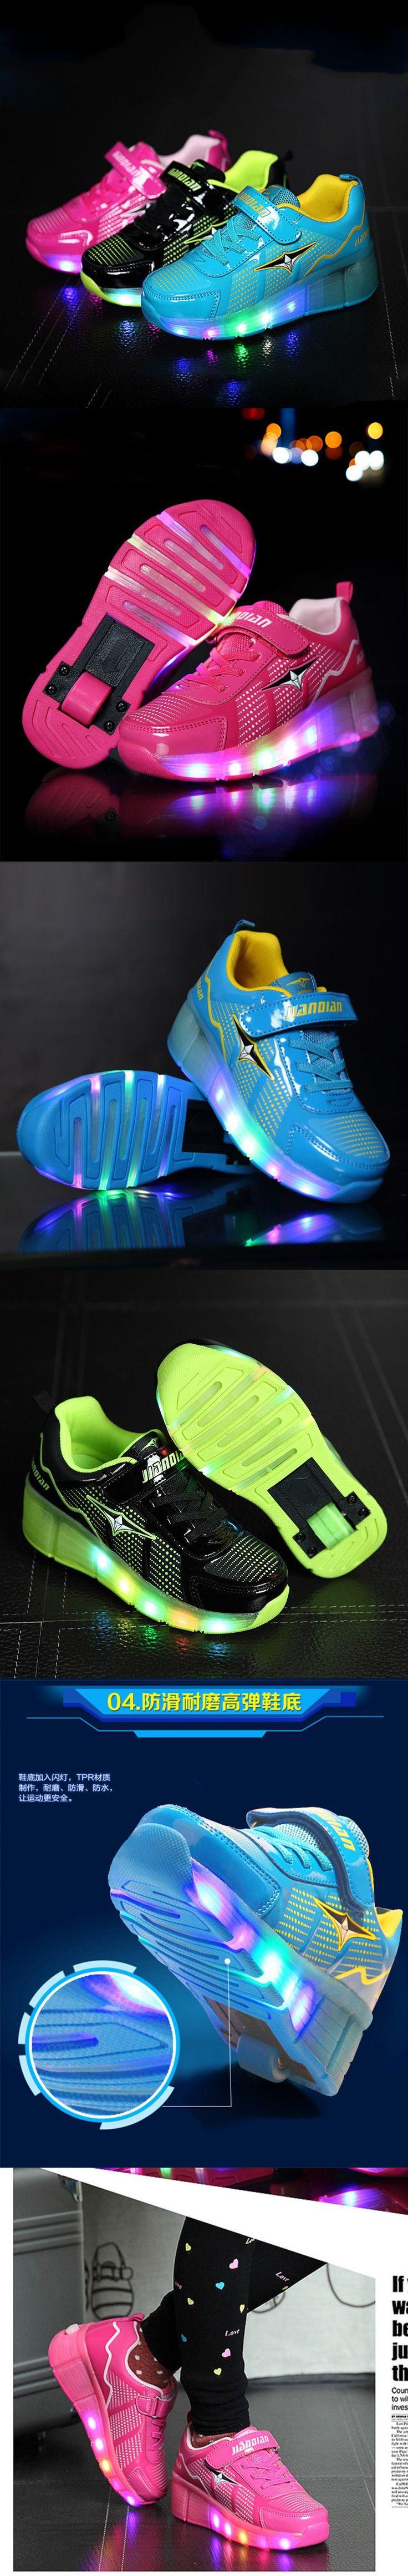 Child Heelys Girls Boys LED Light wHeelys Roller Skate Shoes For Children Kids Sneakers With Wheels Zapatillas Con Ruedas